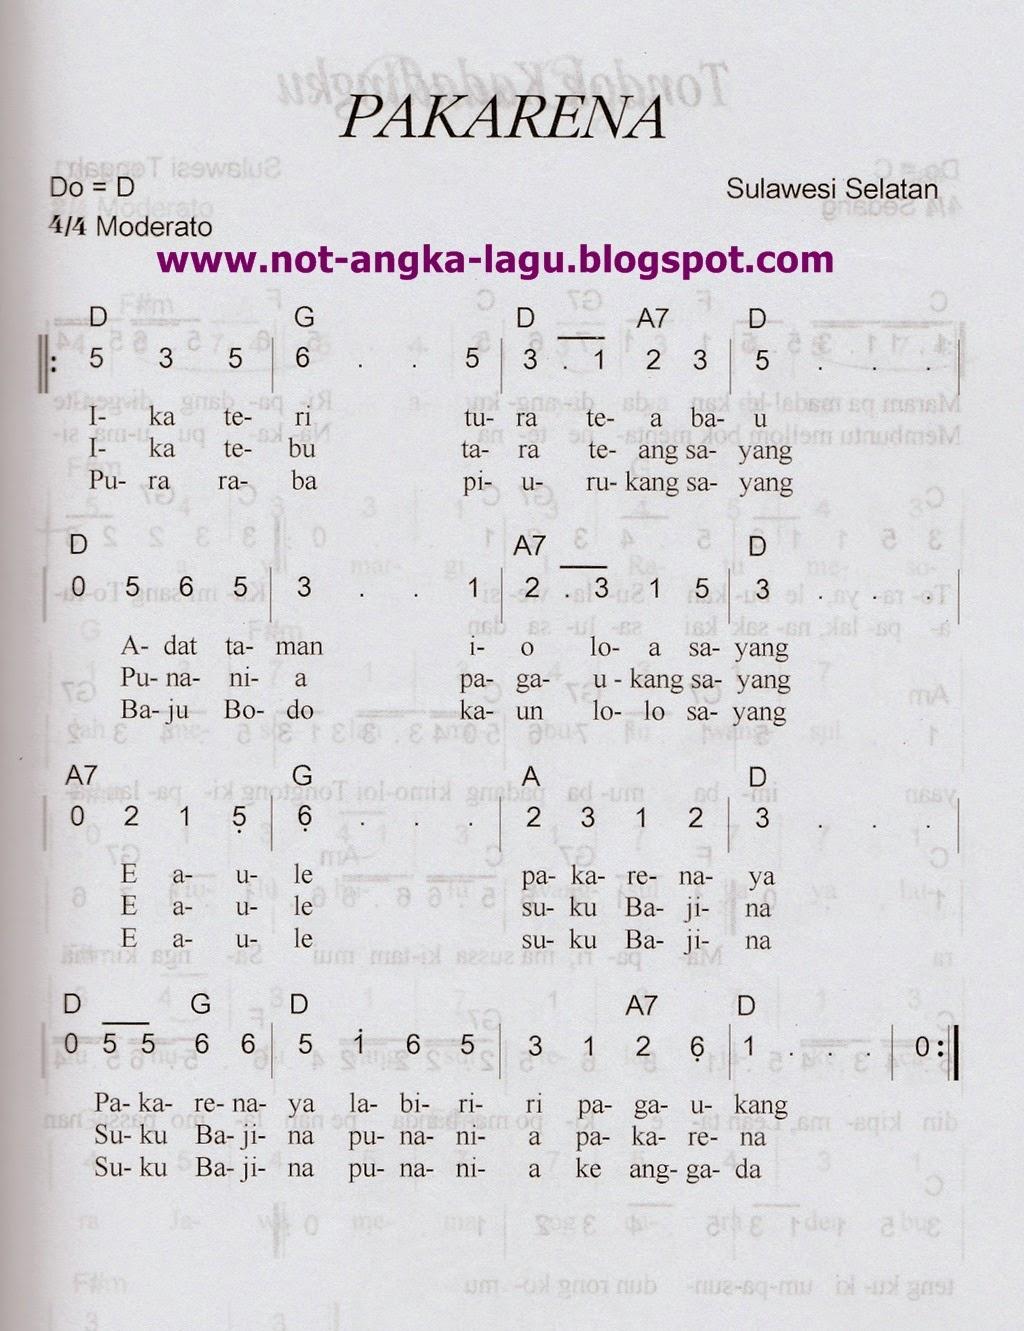 Not Angka Lagu Pakarena by: www.not-angka-lagu.blogspot.com